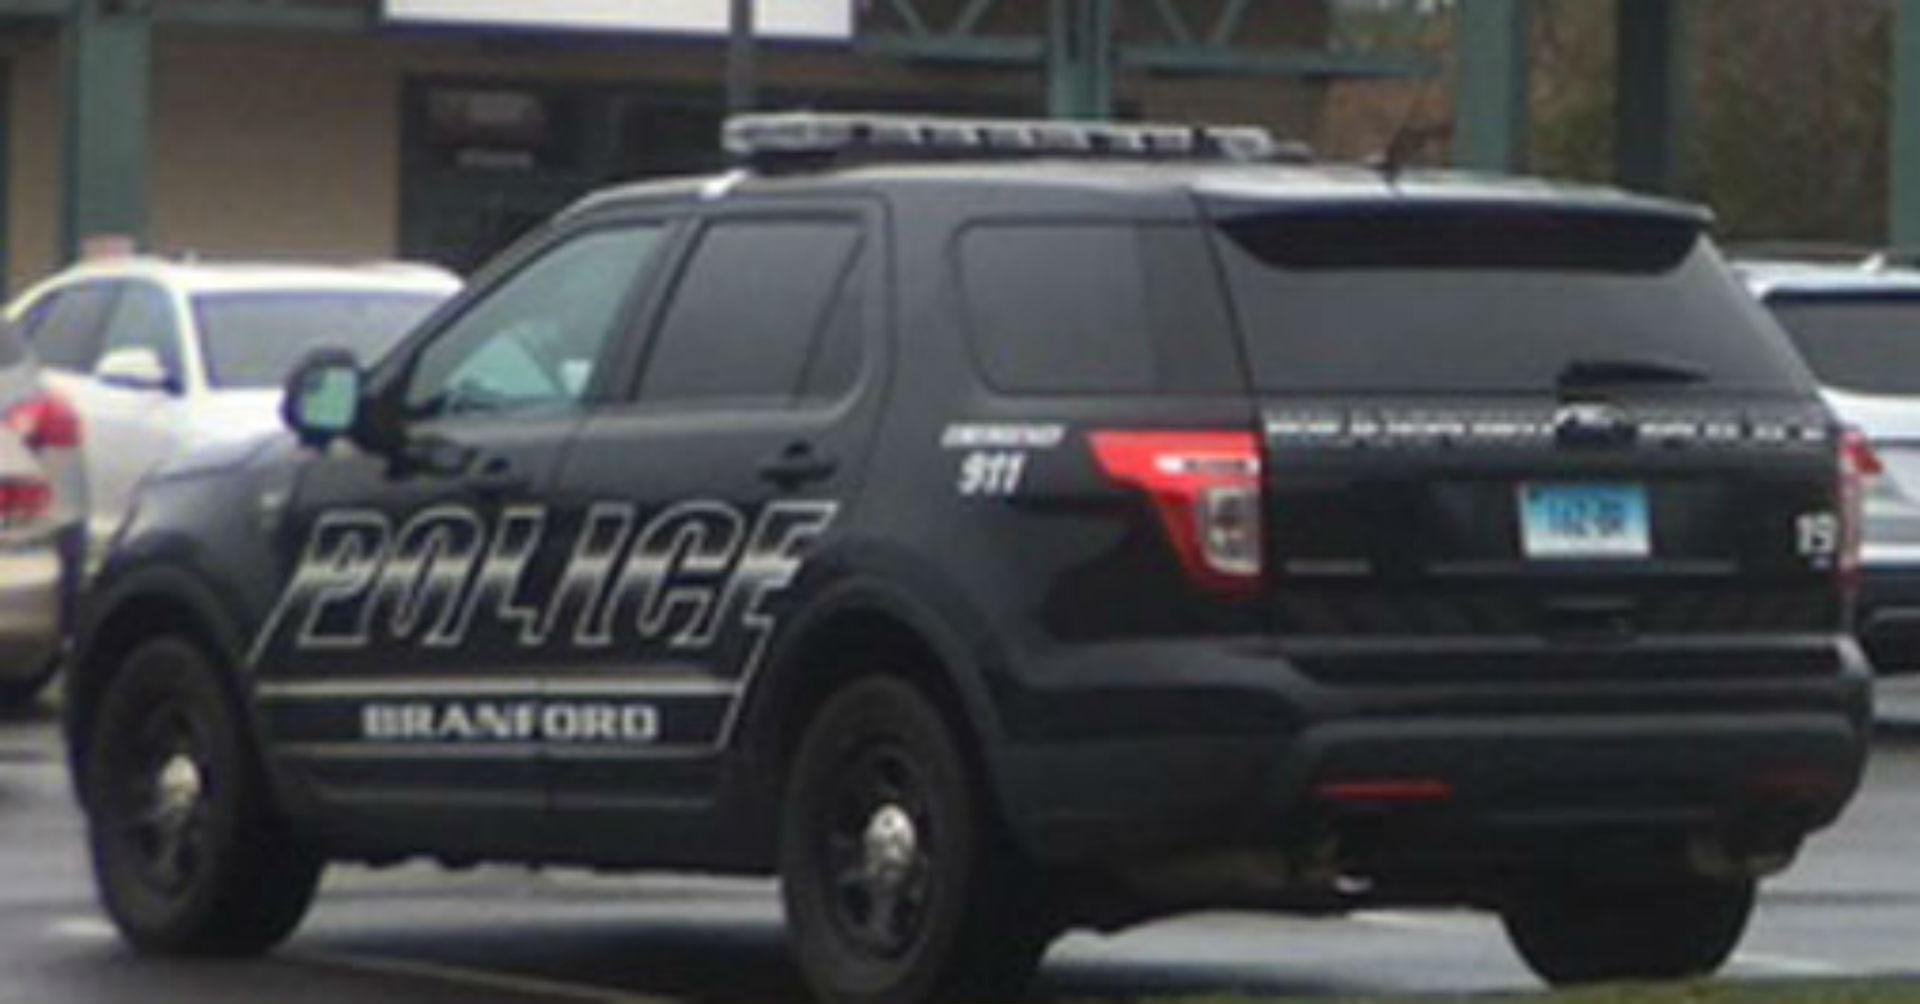 Branford police_1523883475324.jpg.jpg